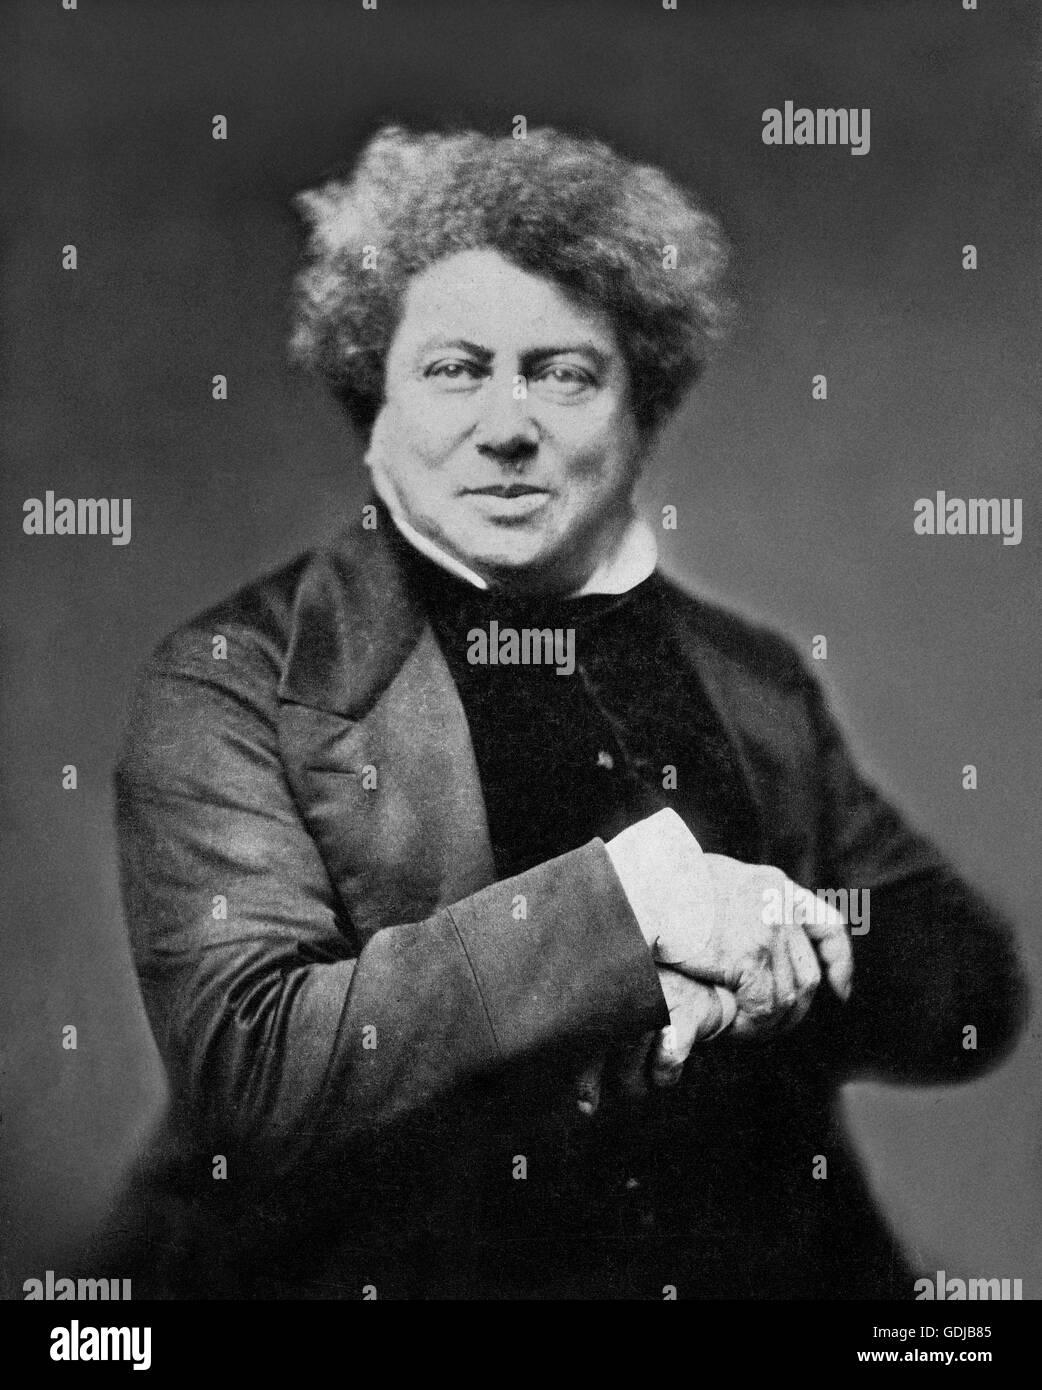 Alexandre Dumas. Portrait of the French writer, Alexandre Dumas, père (1802-1870), famous for works such as - Stock Image